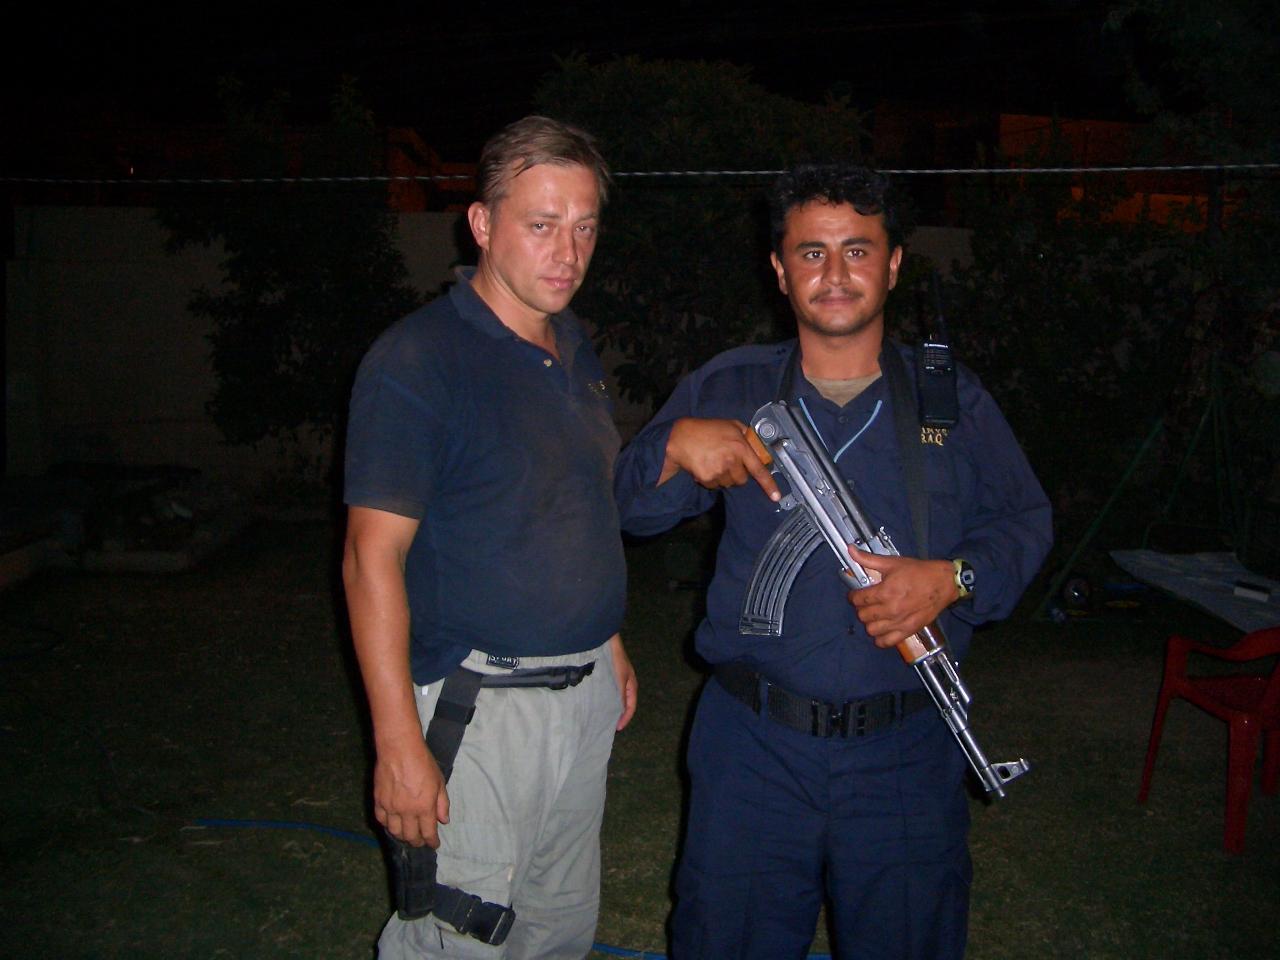 Oleg and kurd